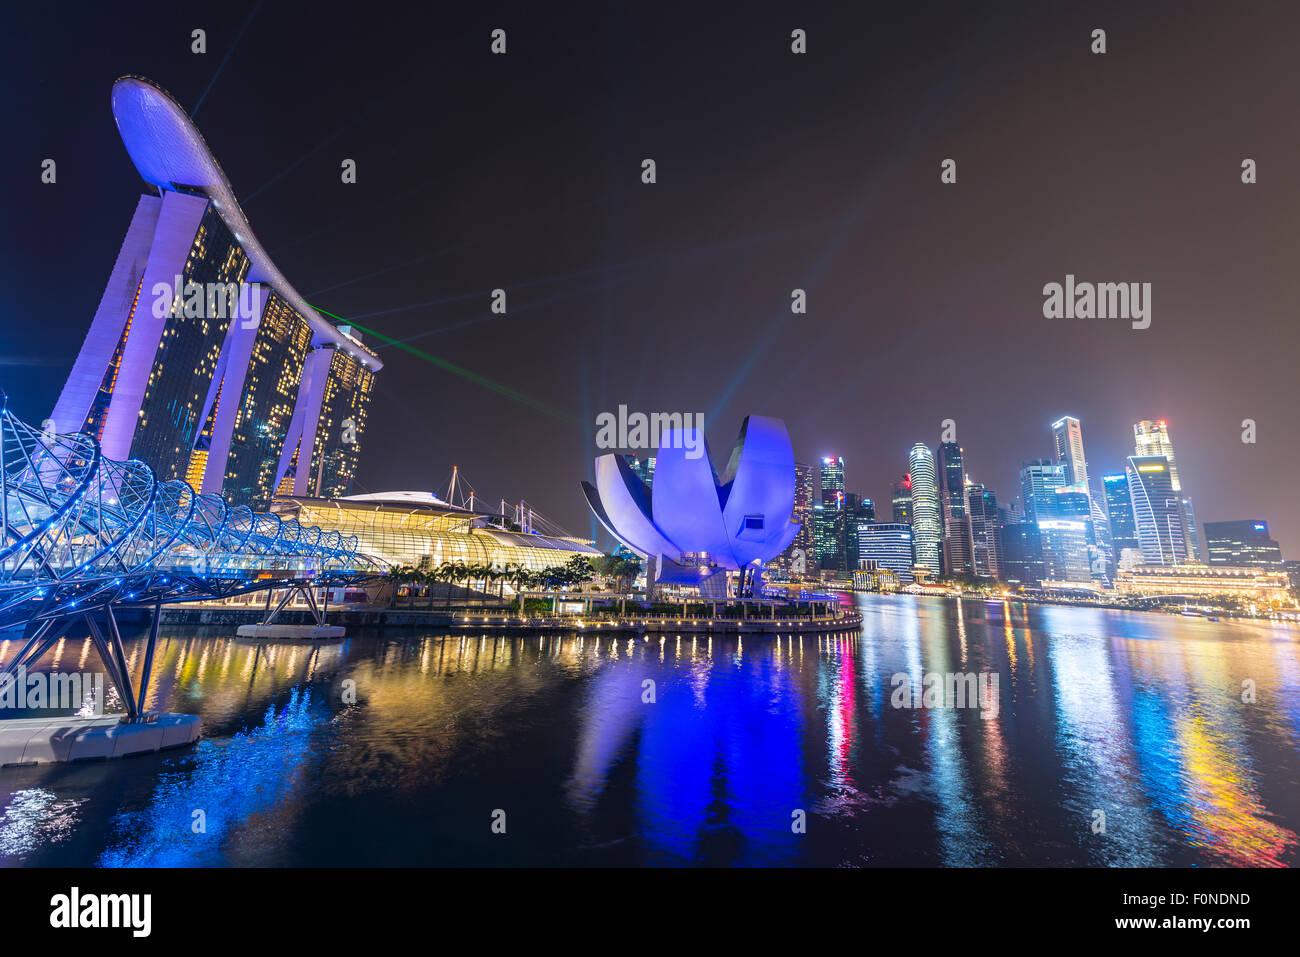 Light show, Millenium Bridge, Marina Bay Sands Hotel, Marina Bay, Museum of Science and Art, at night, Singapore - Stock Image